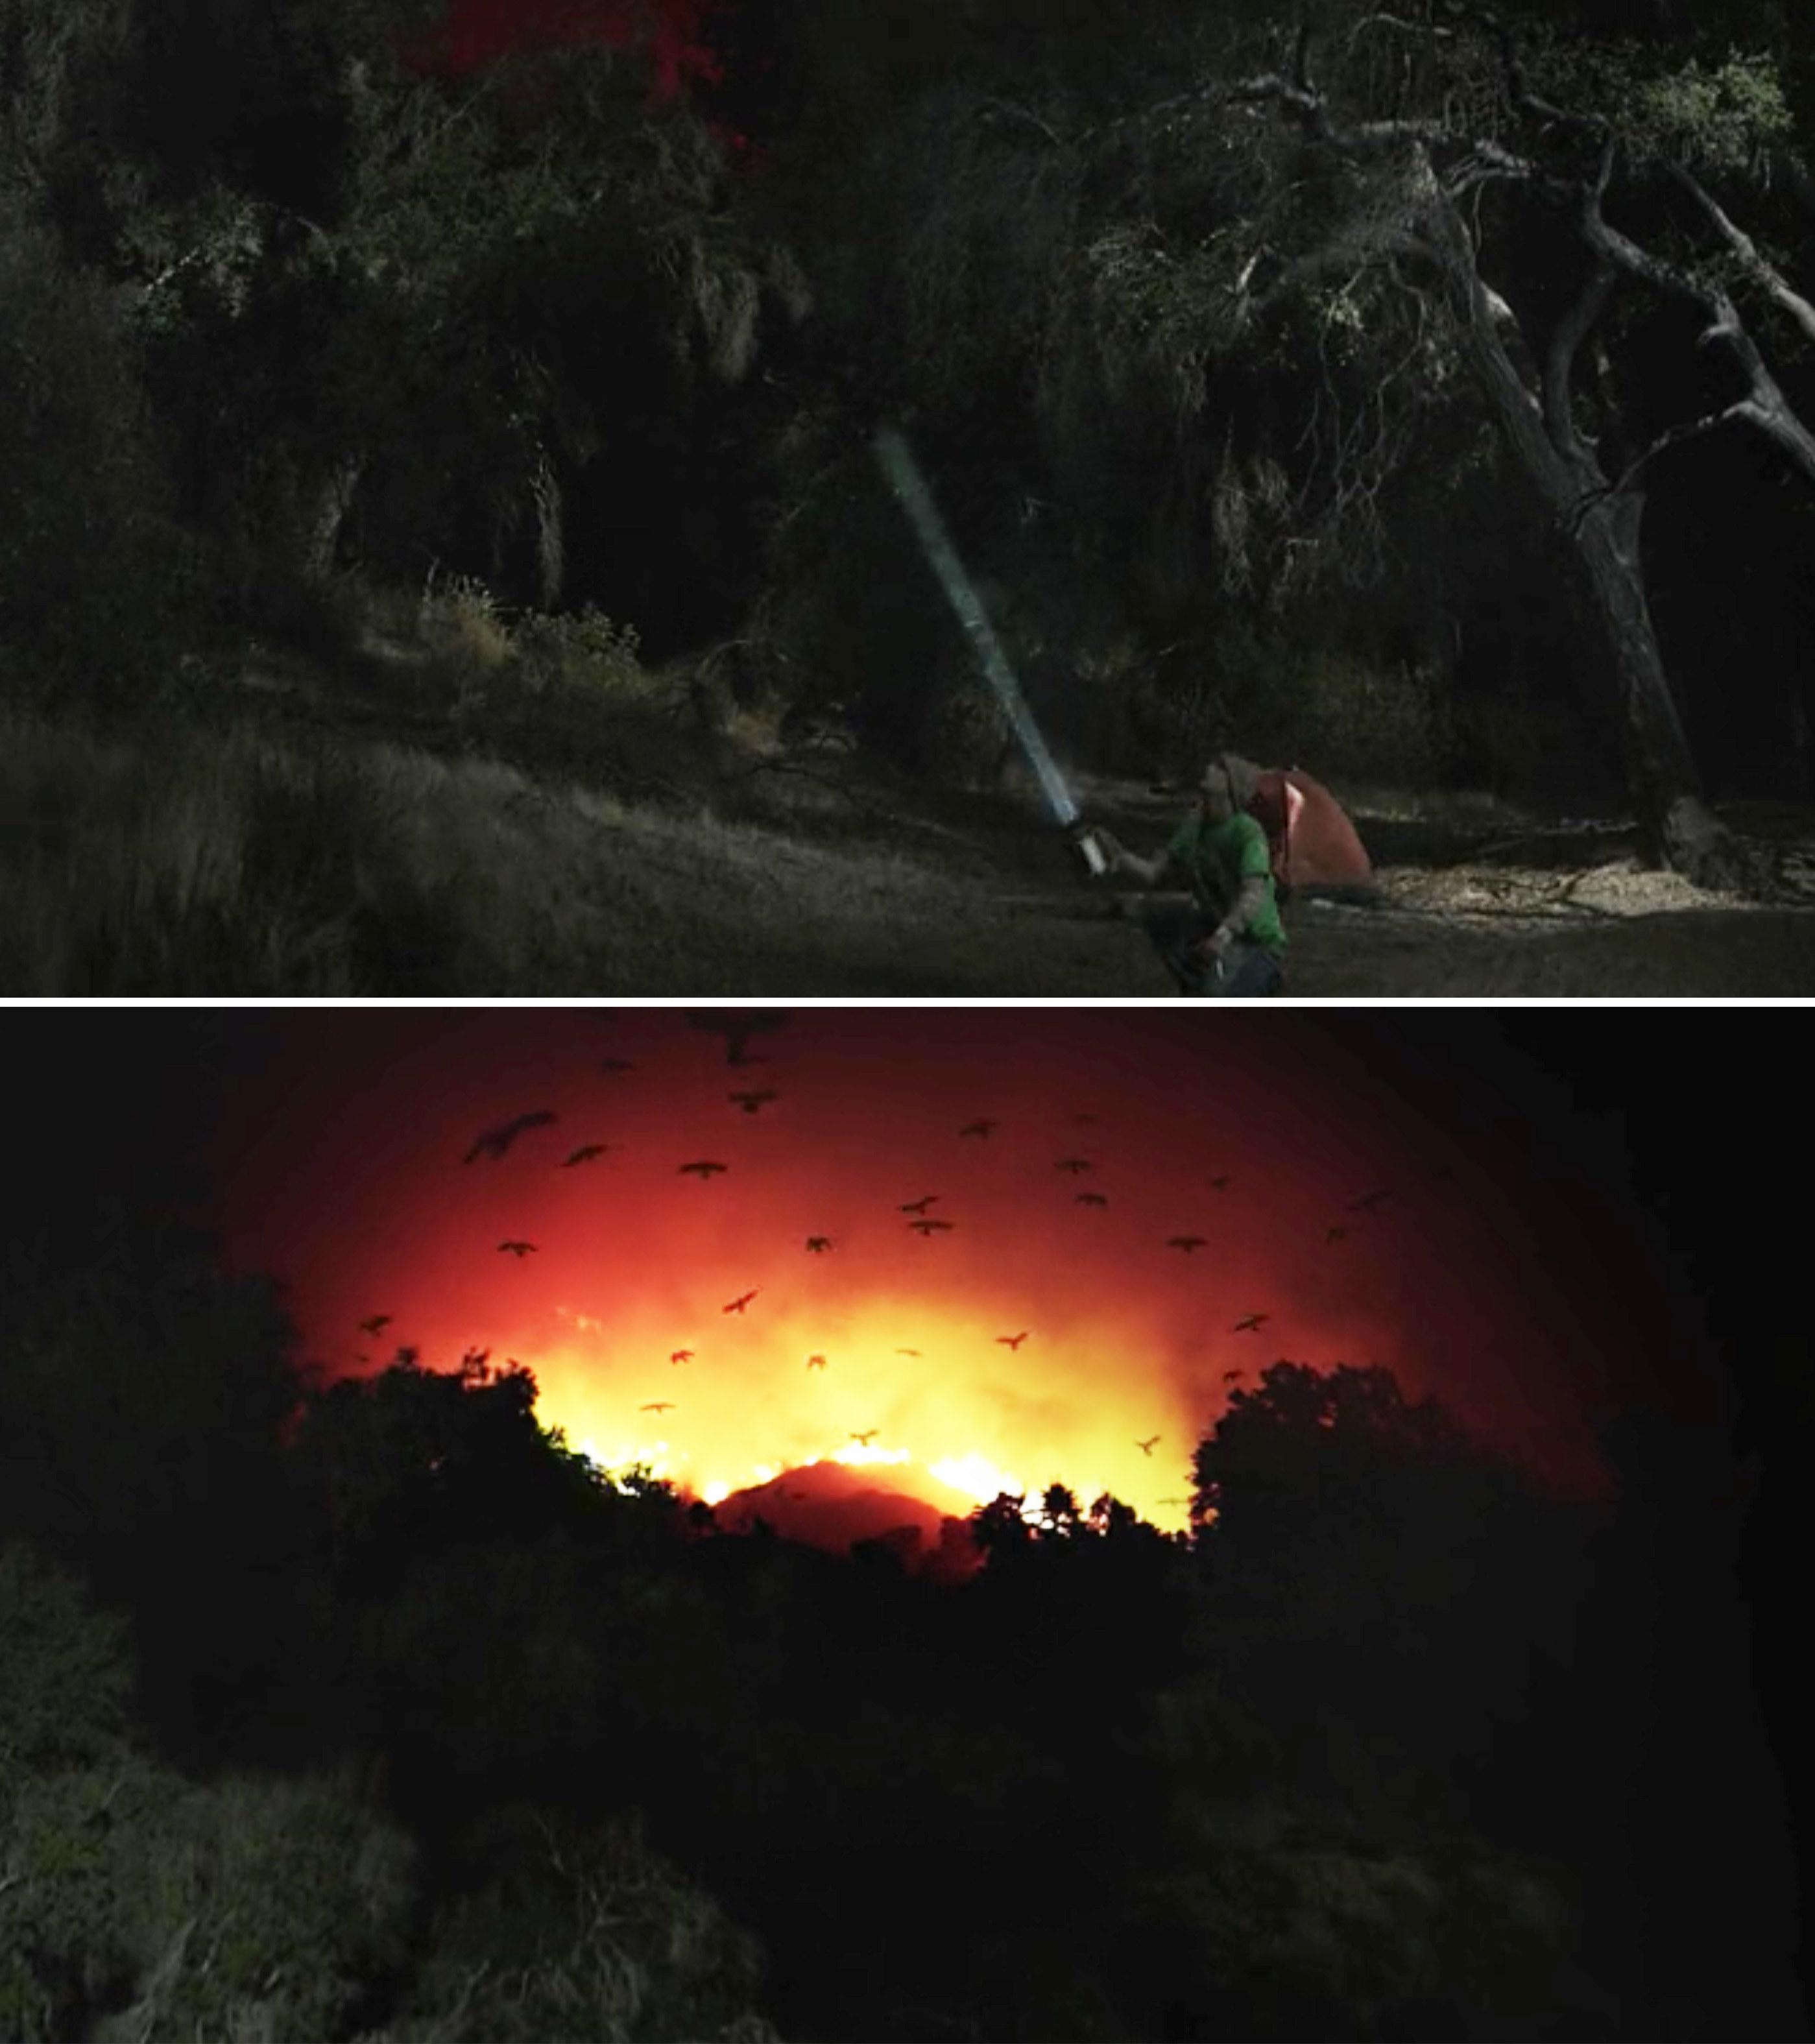 A massive wildfire on the horizon